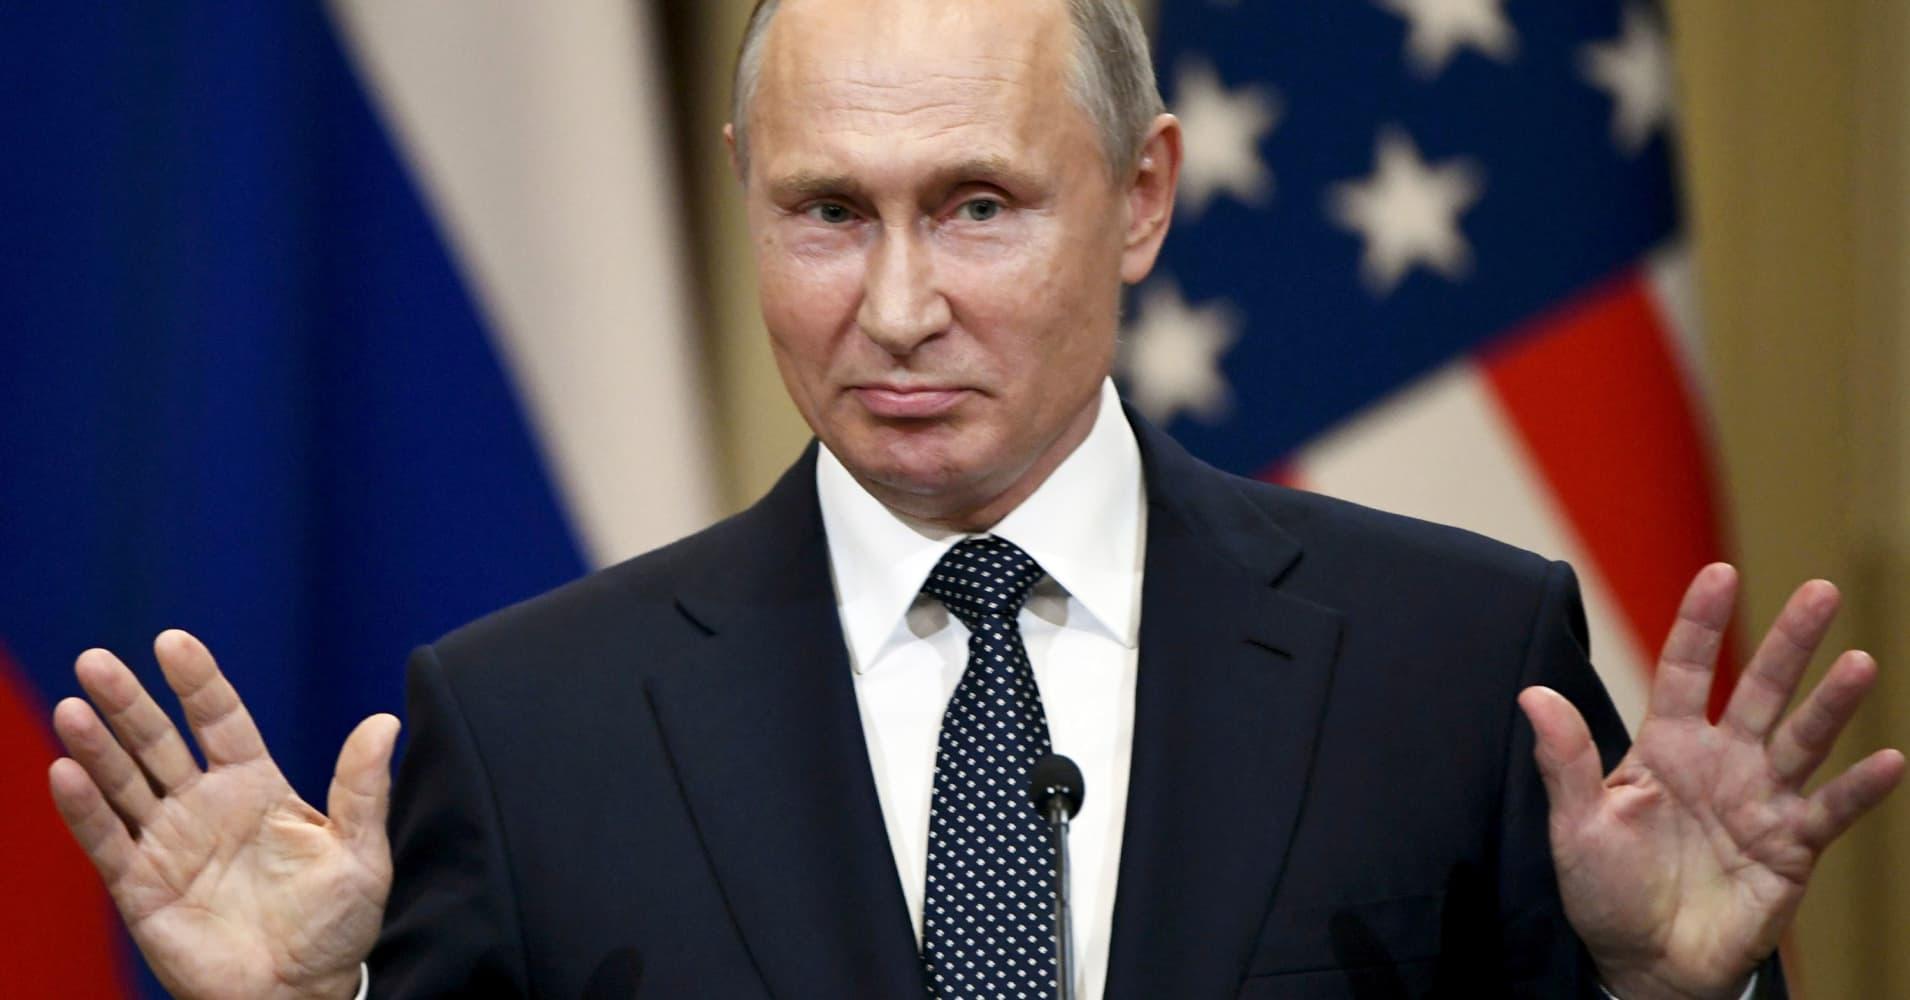 Putin dilutes unpopular pension reform that has hurt his popularity